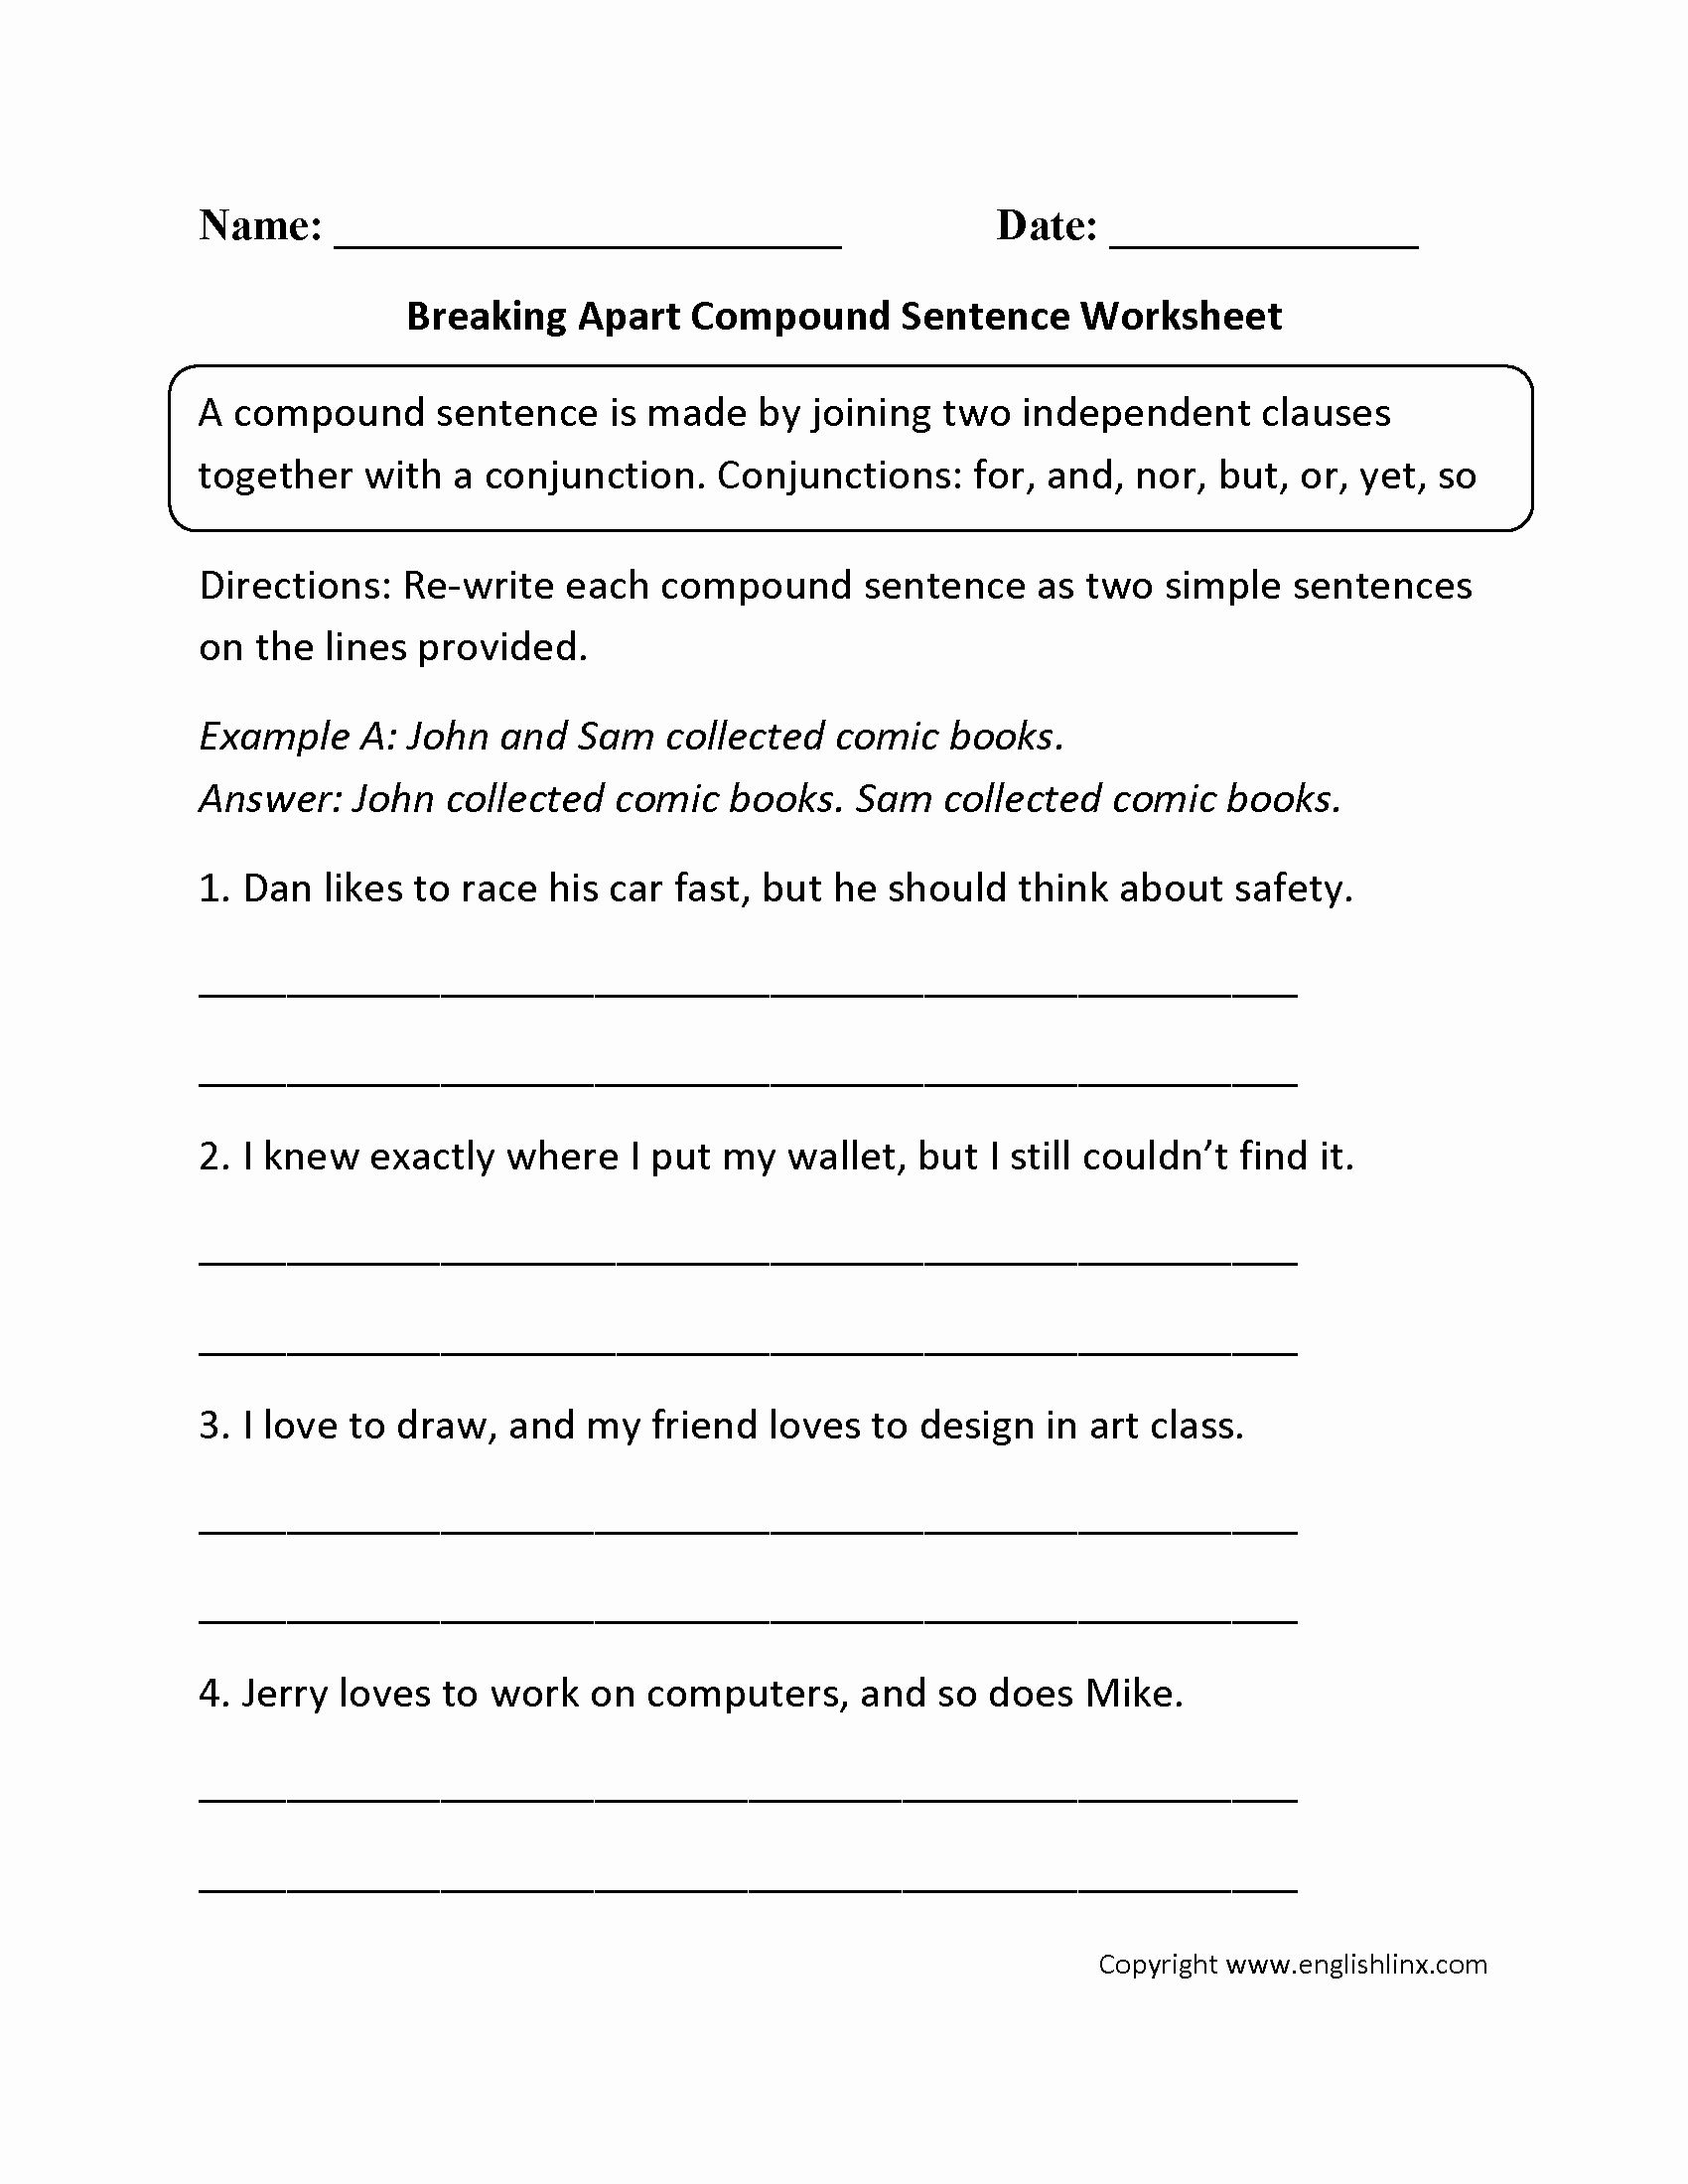 Compound Sentences Worksheet Inspirational Sentence